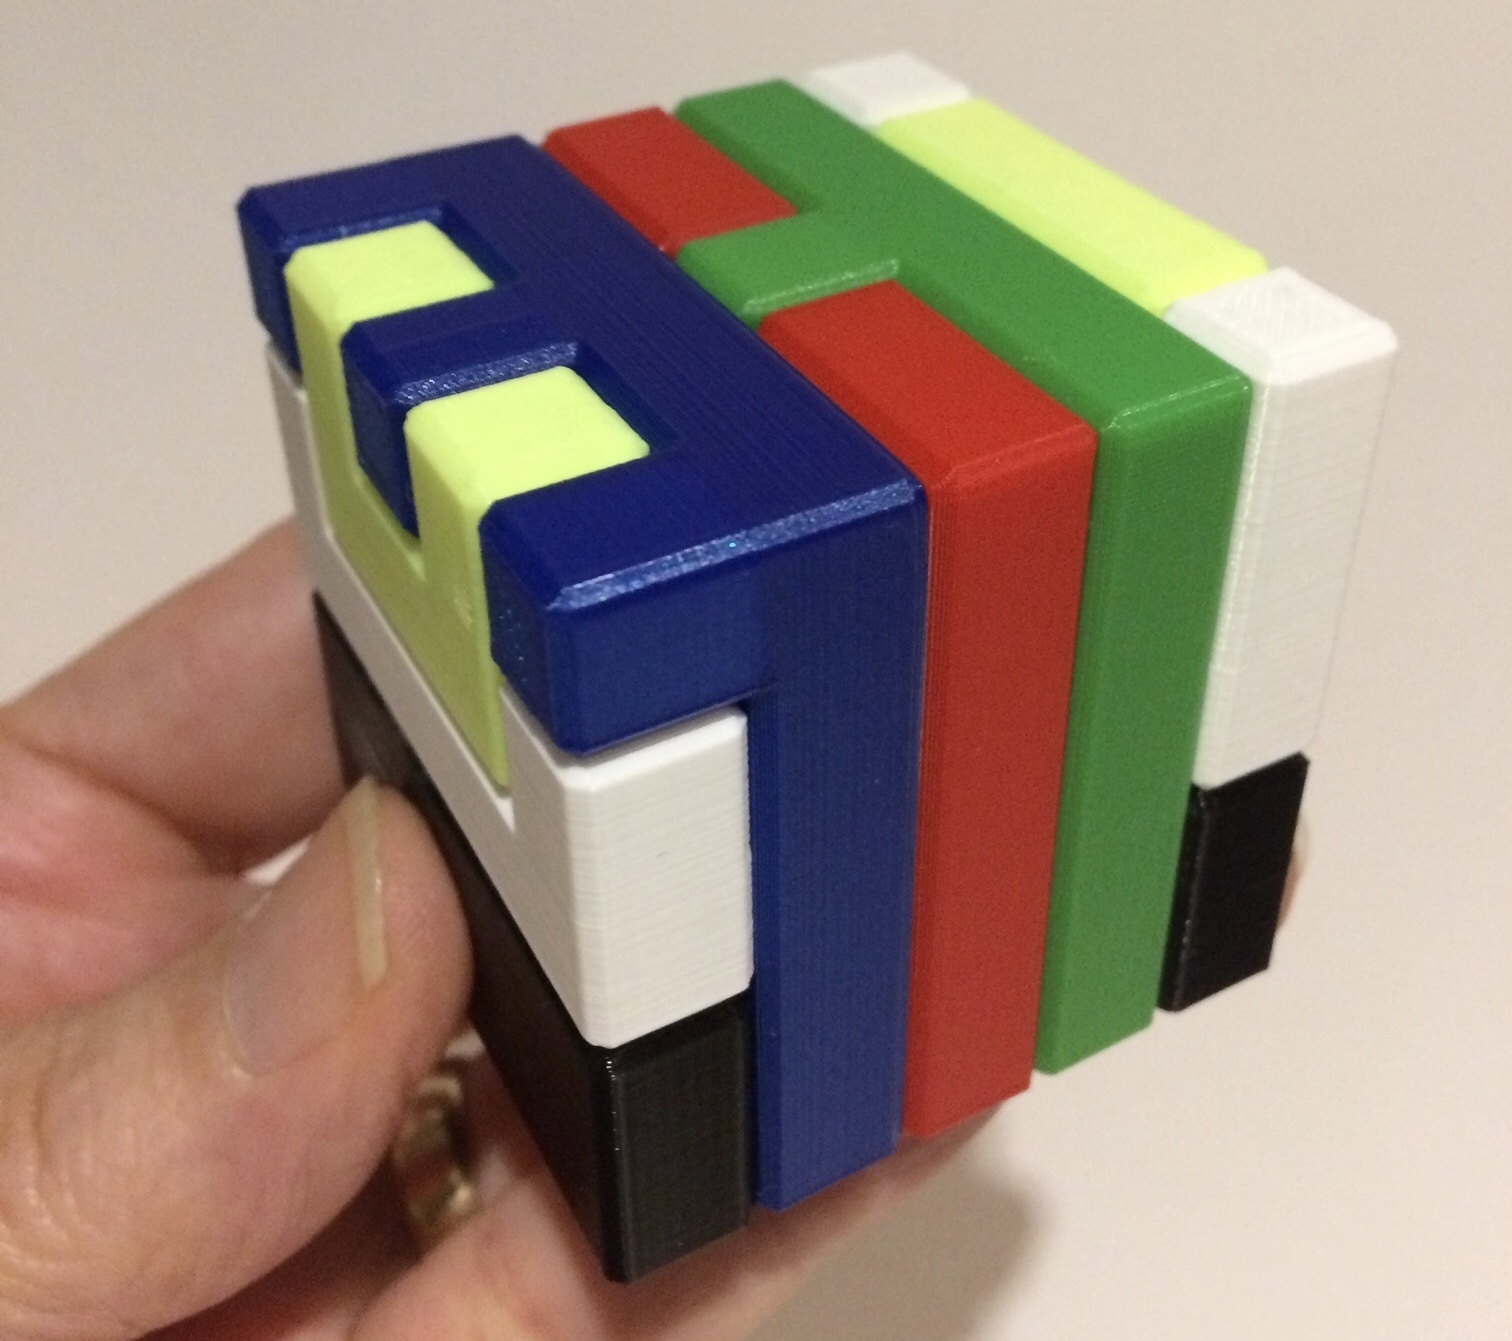 506af8e41e1eb Printable Interlocking Puzzle #4 - Level 11 by richgain @ Pinshape